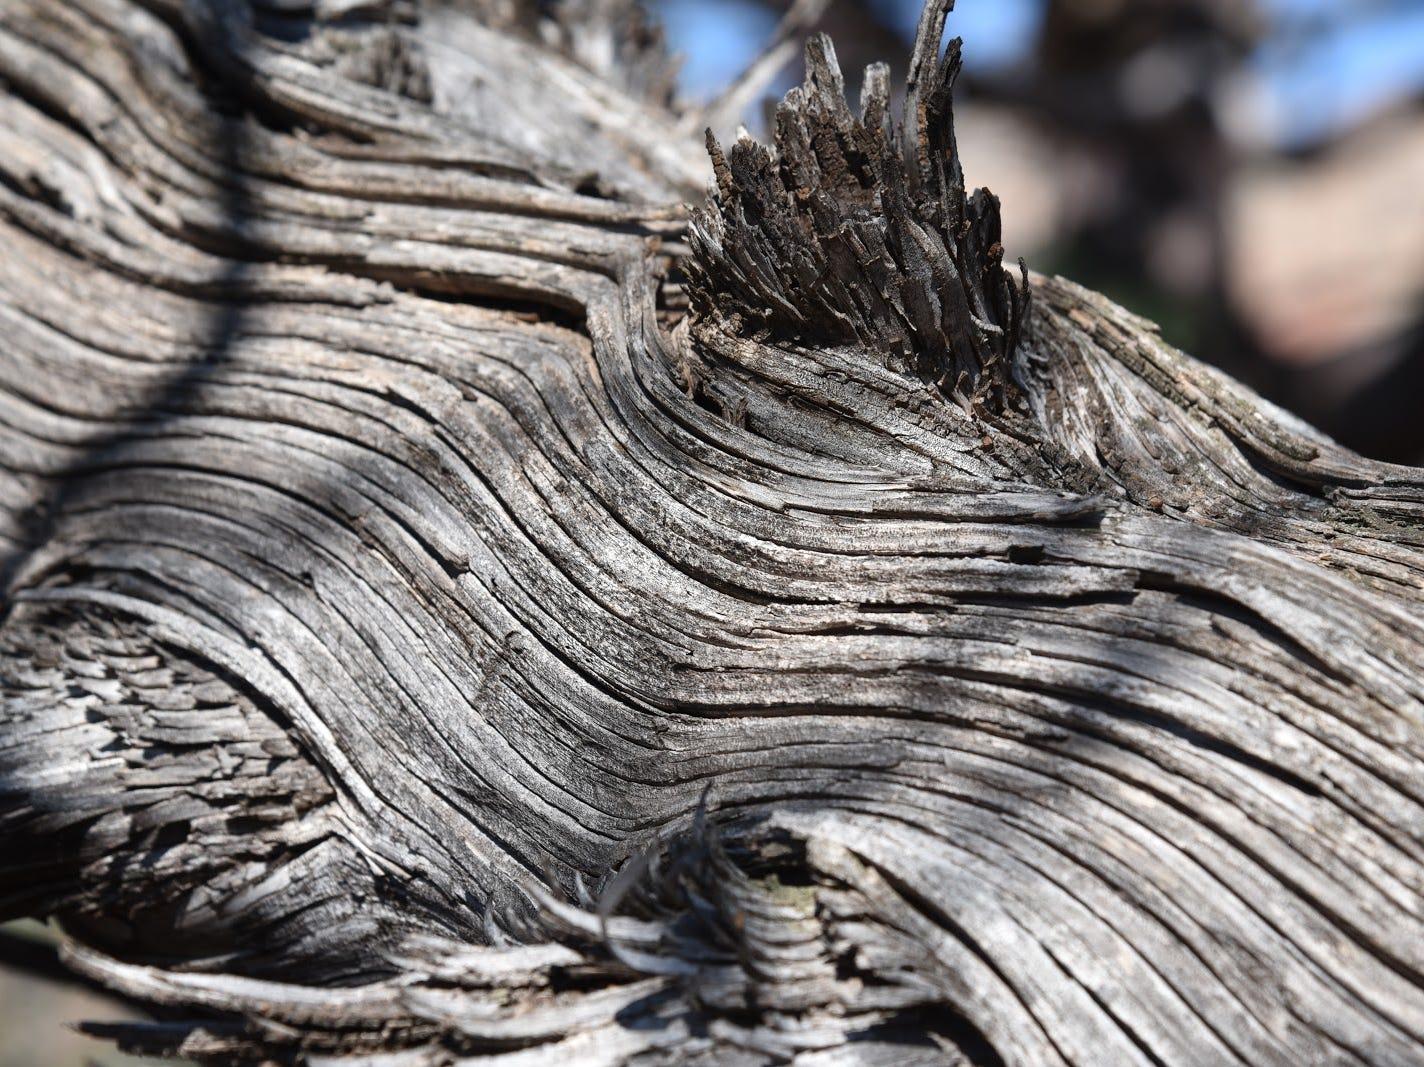 Artistic natural textures.